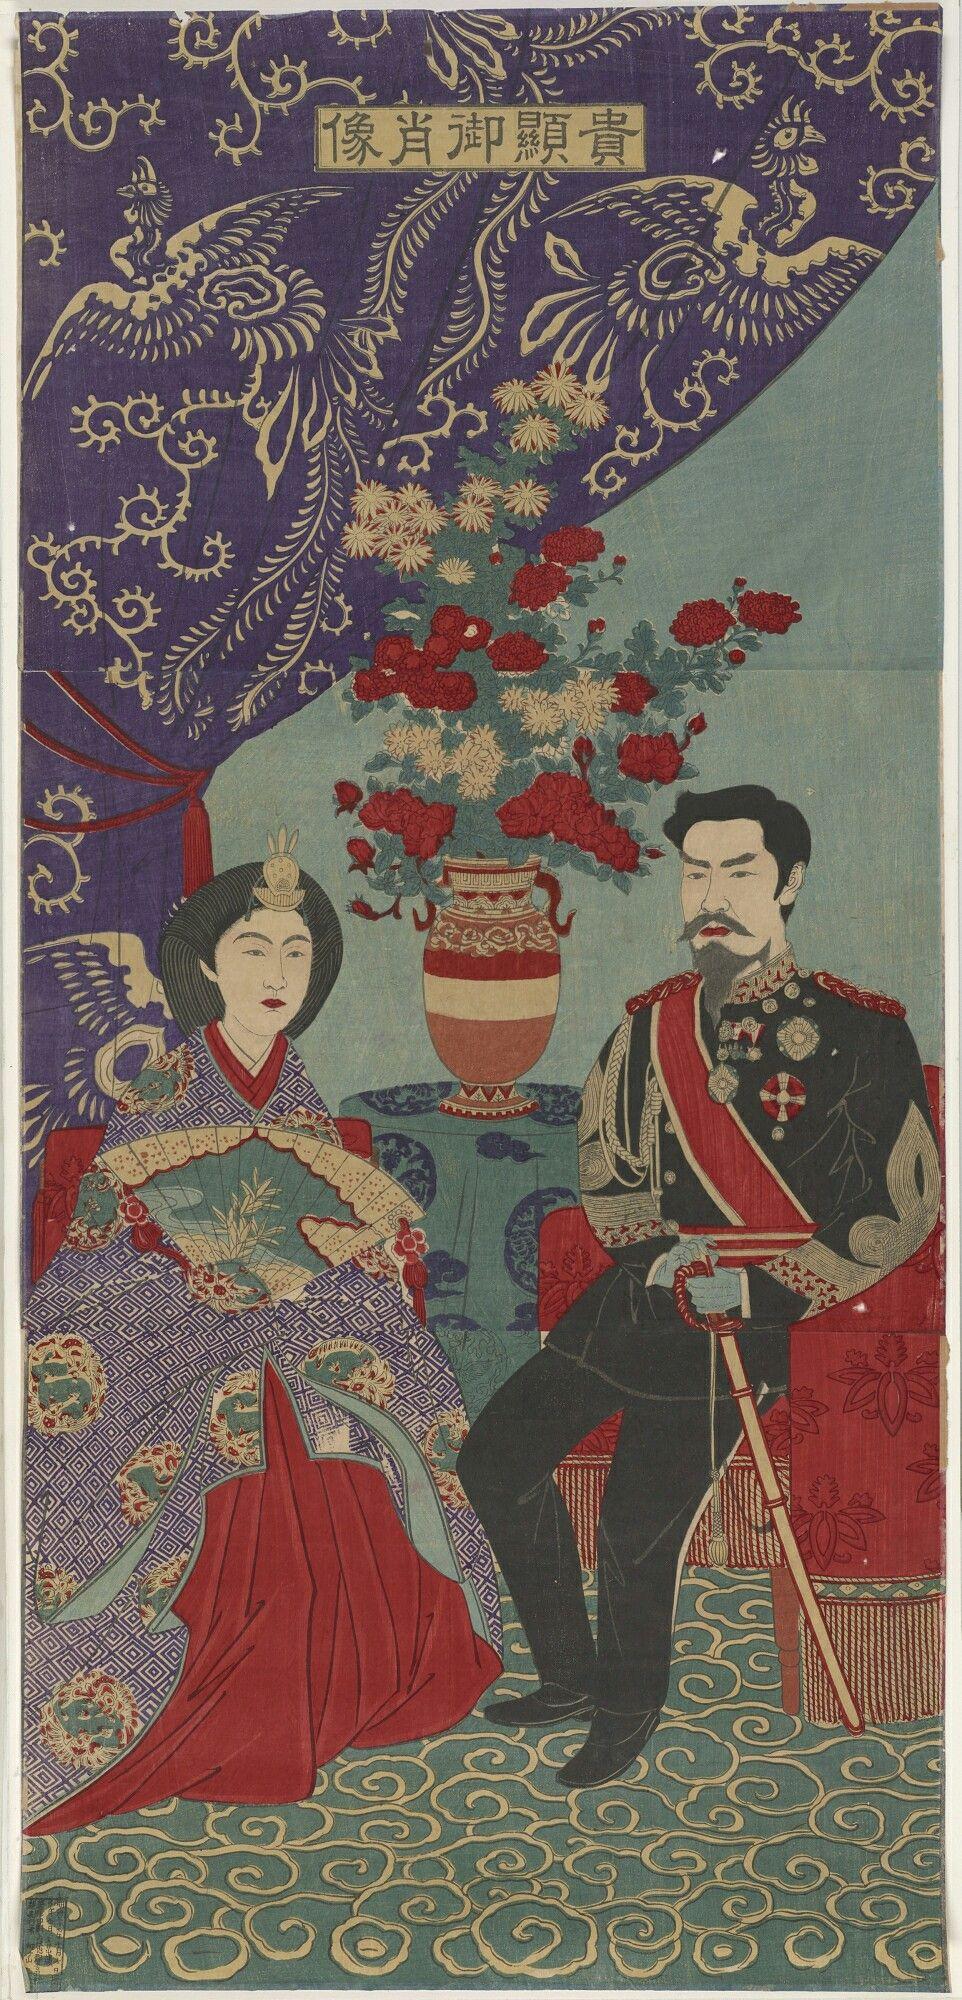 emperor meiji and empress haruko 大正 幕末 写真